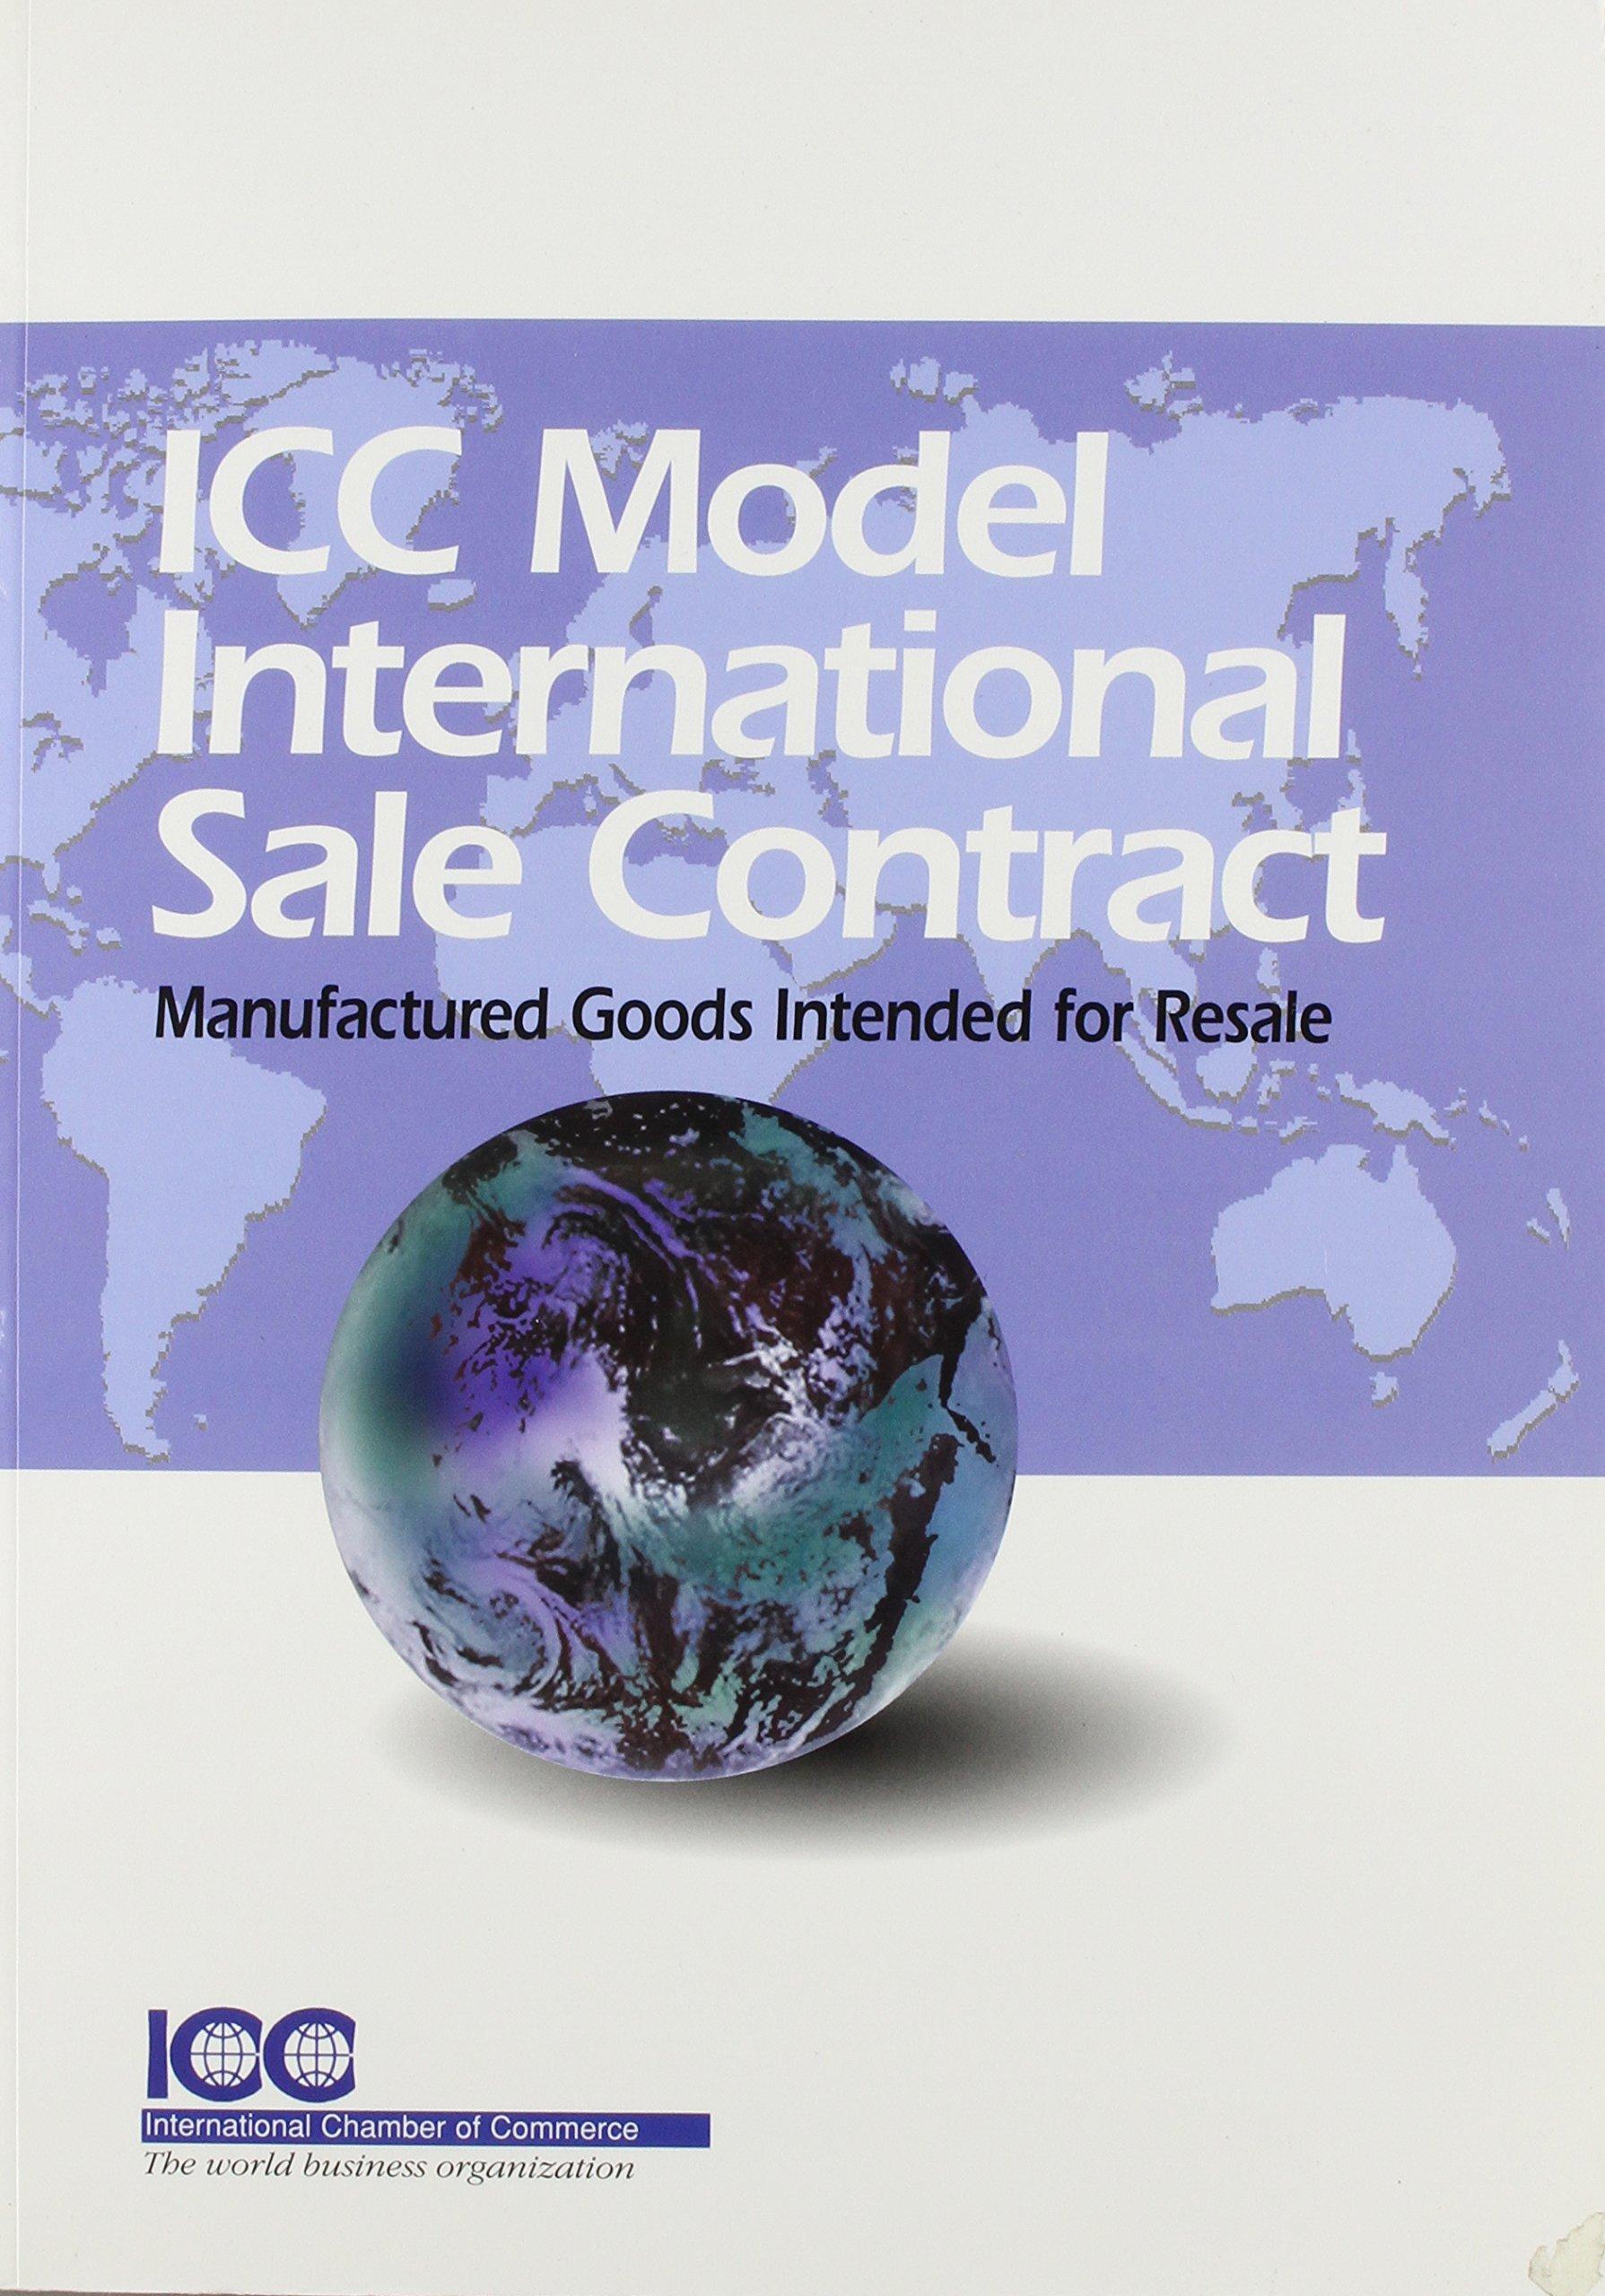 ICC Model International Sale Contract